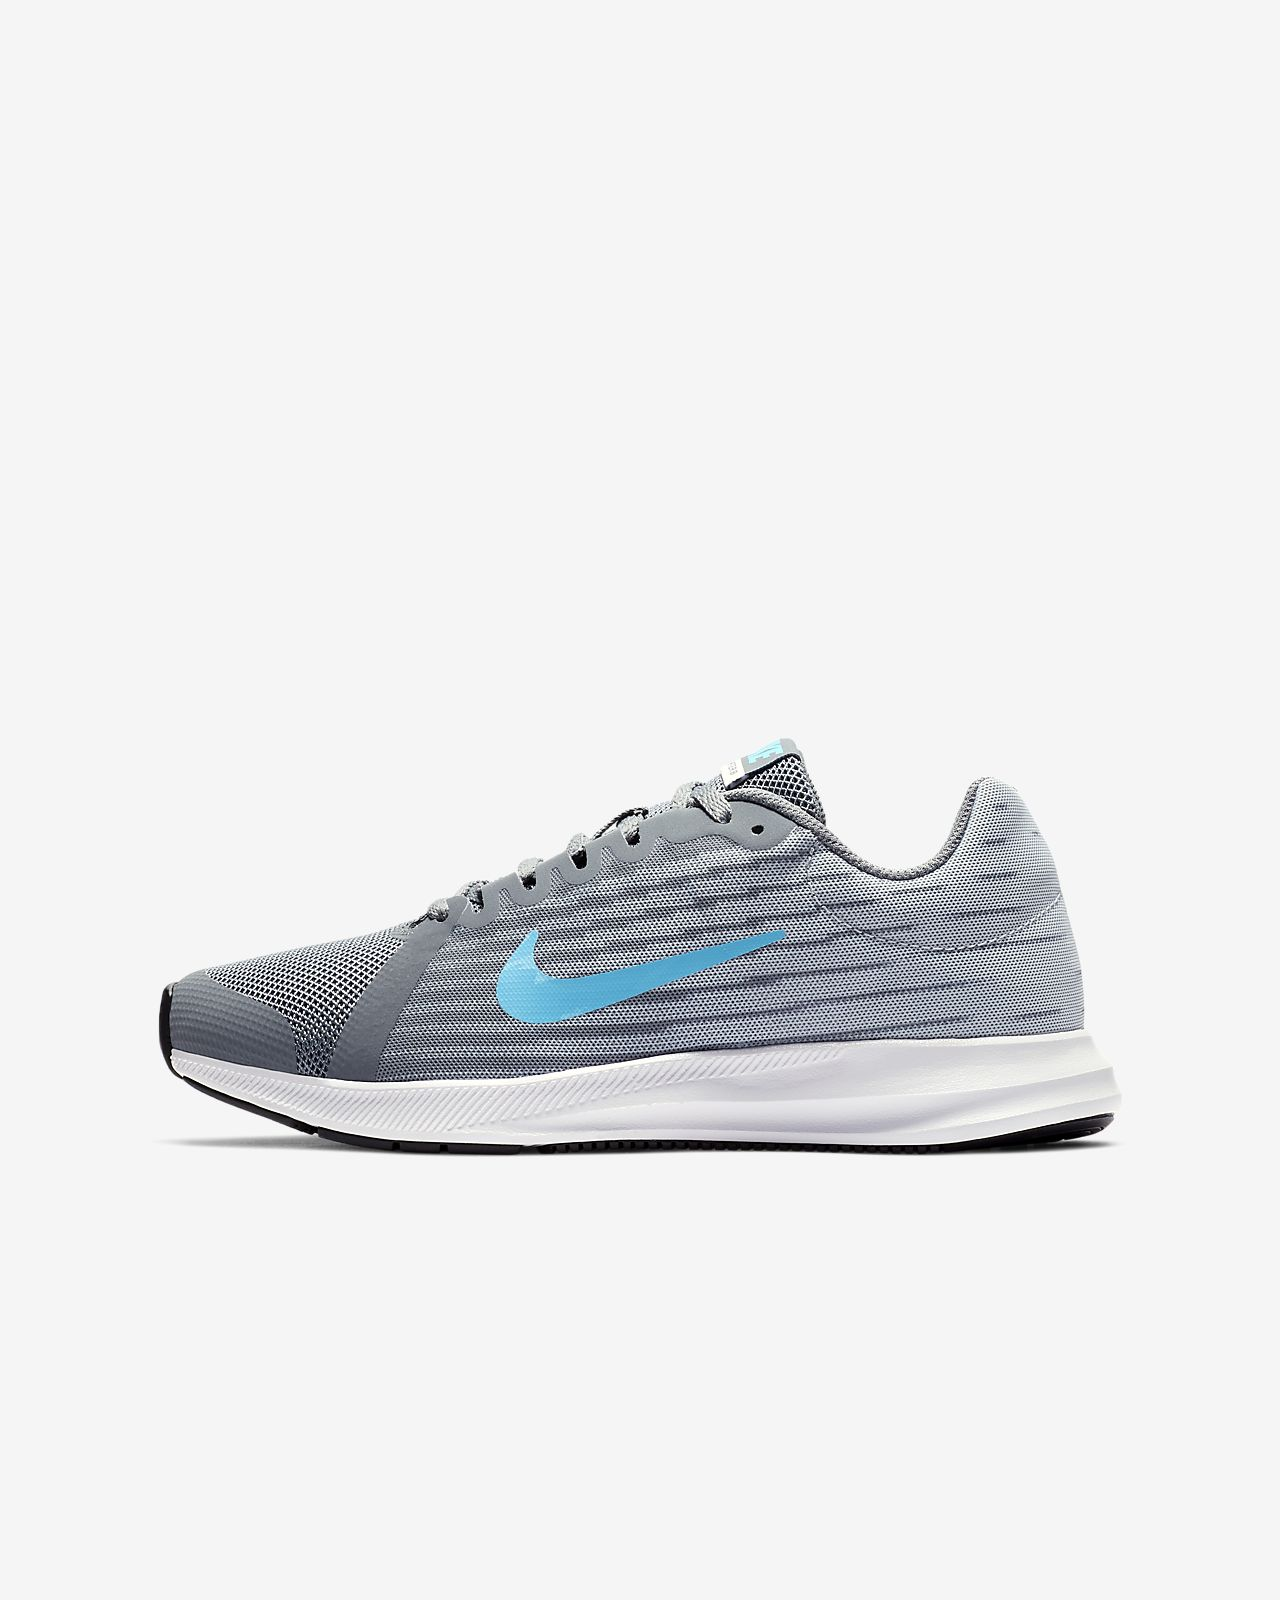 a5a91f7b0 Nike Downshifter 8 Zapatillas de running - Niño. Nike.com ES